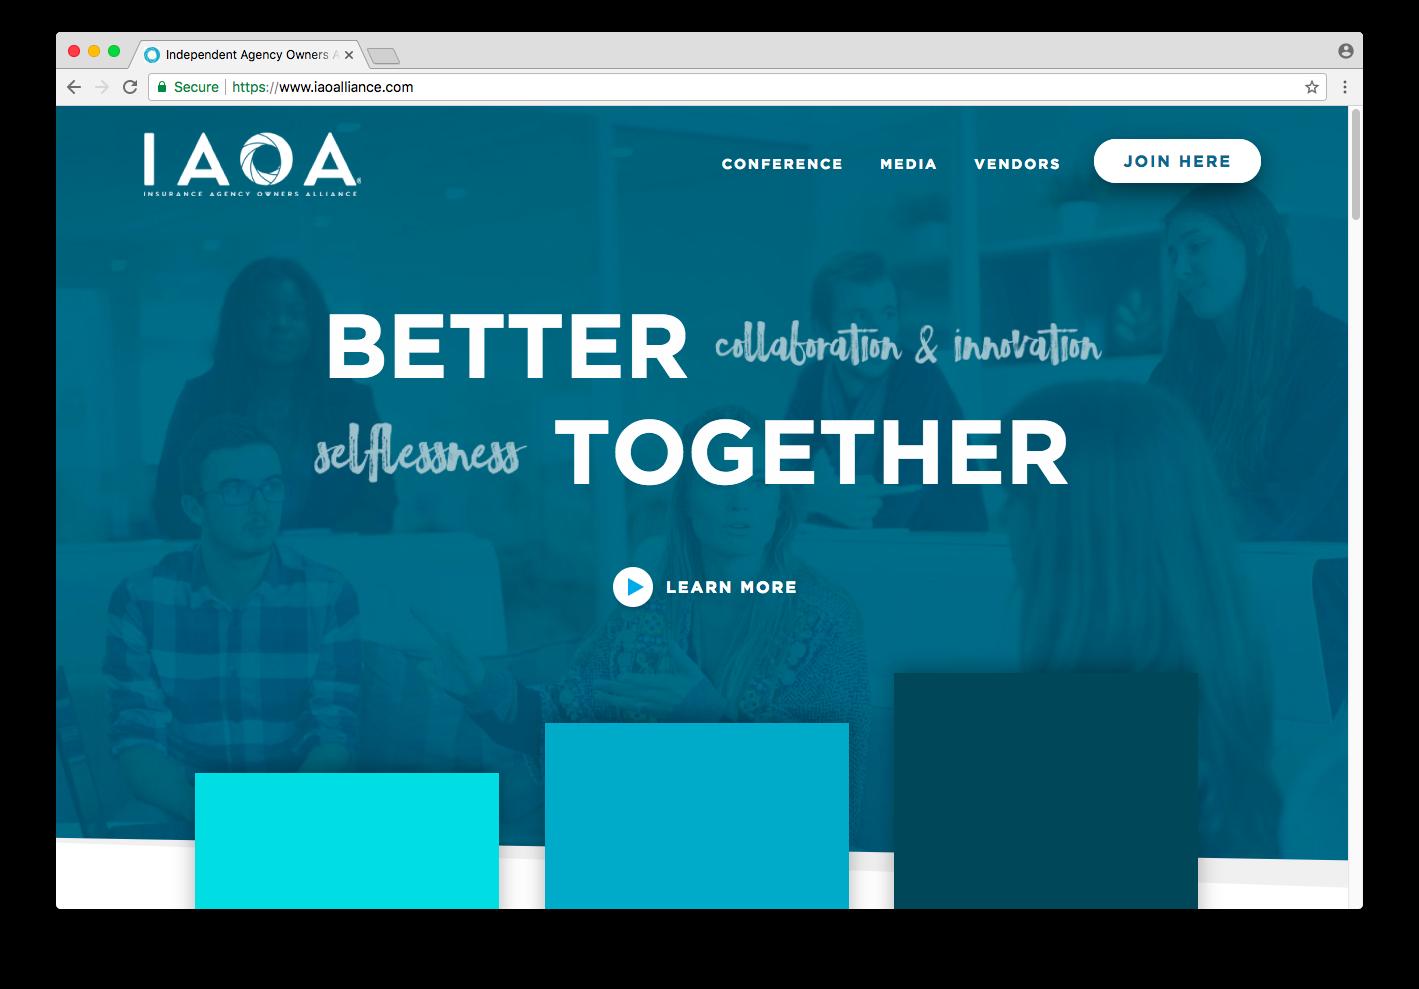 IAOA Alliance